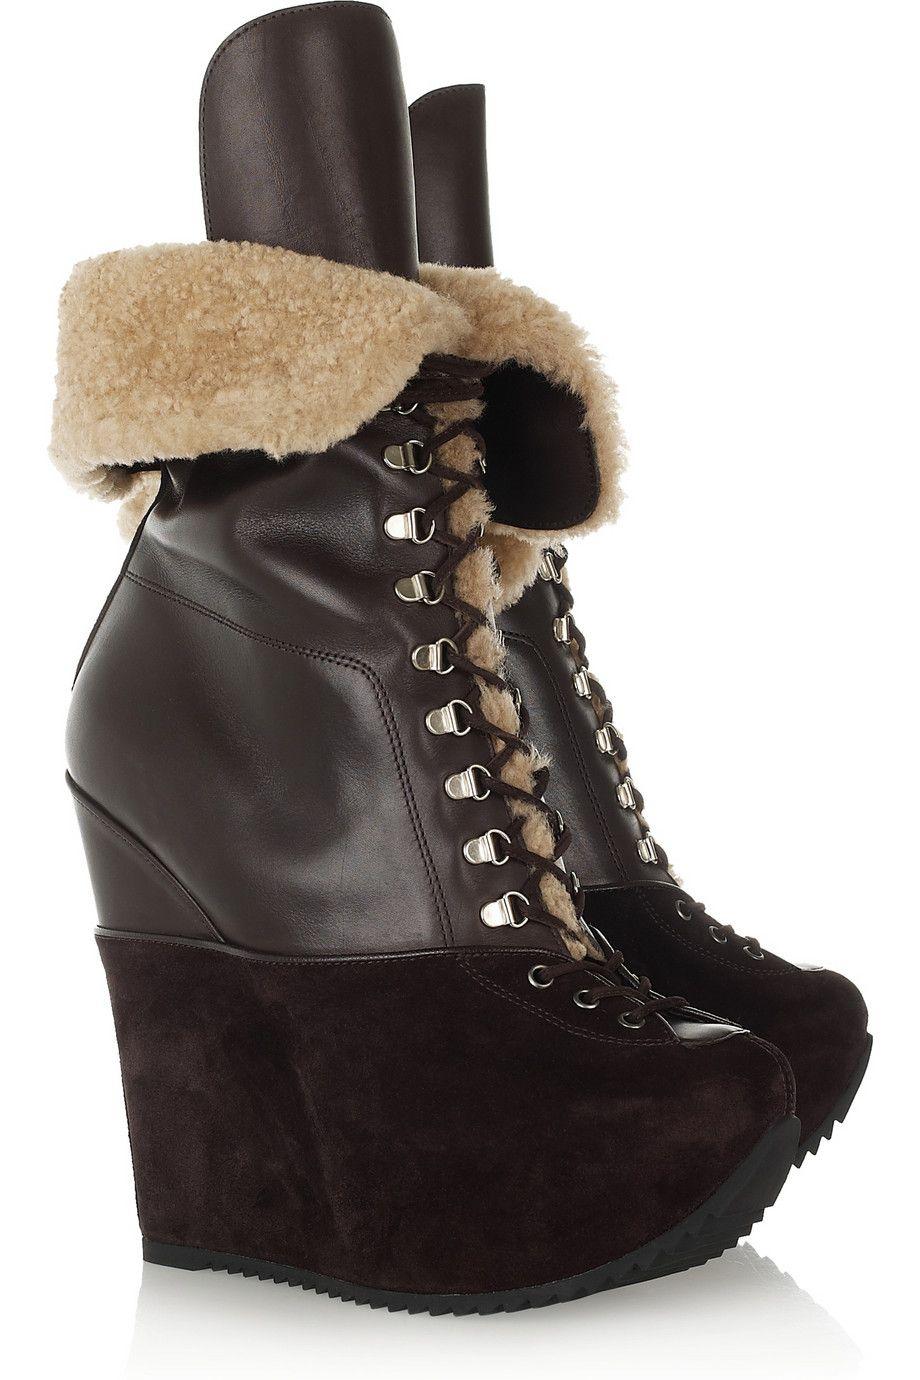 buy cheap tumblr buy cheap discount Yves Saint Laurent Ariane Platform Boots apLF1WKMNn